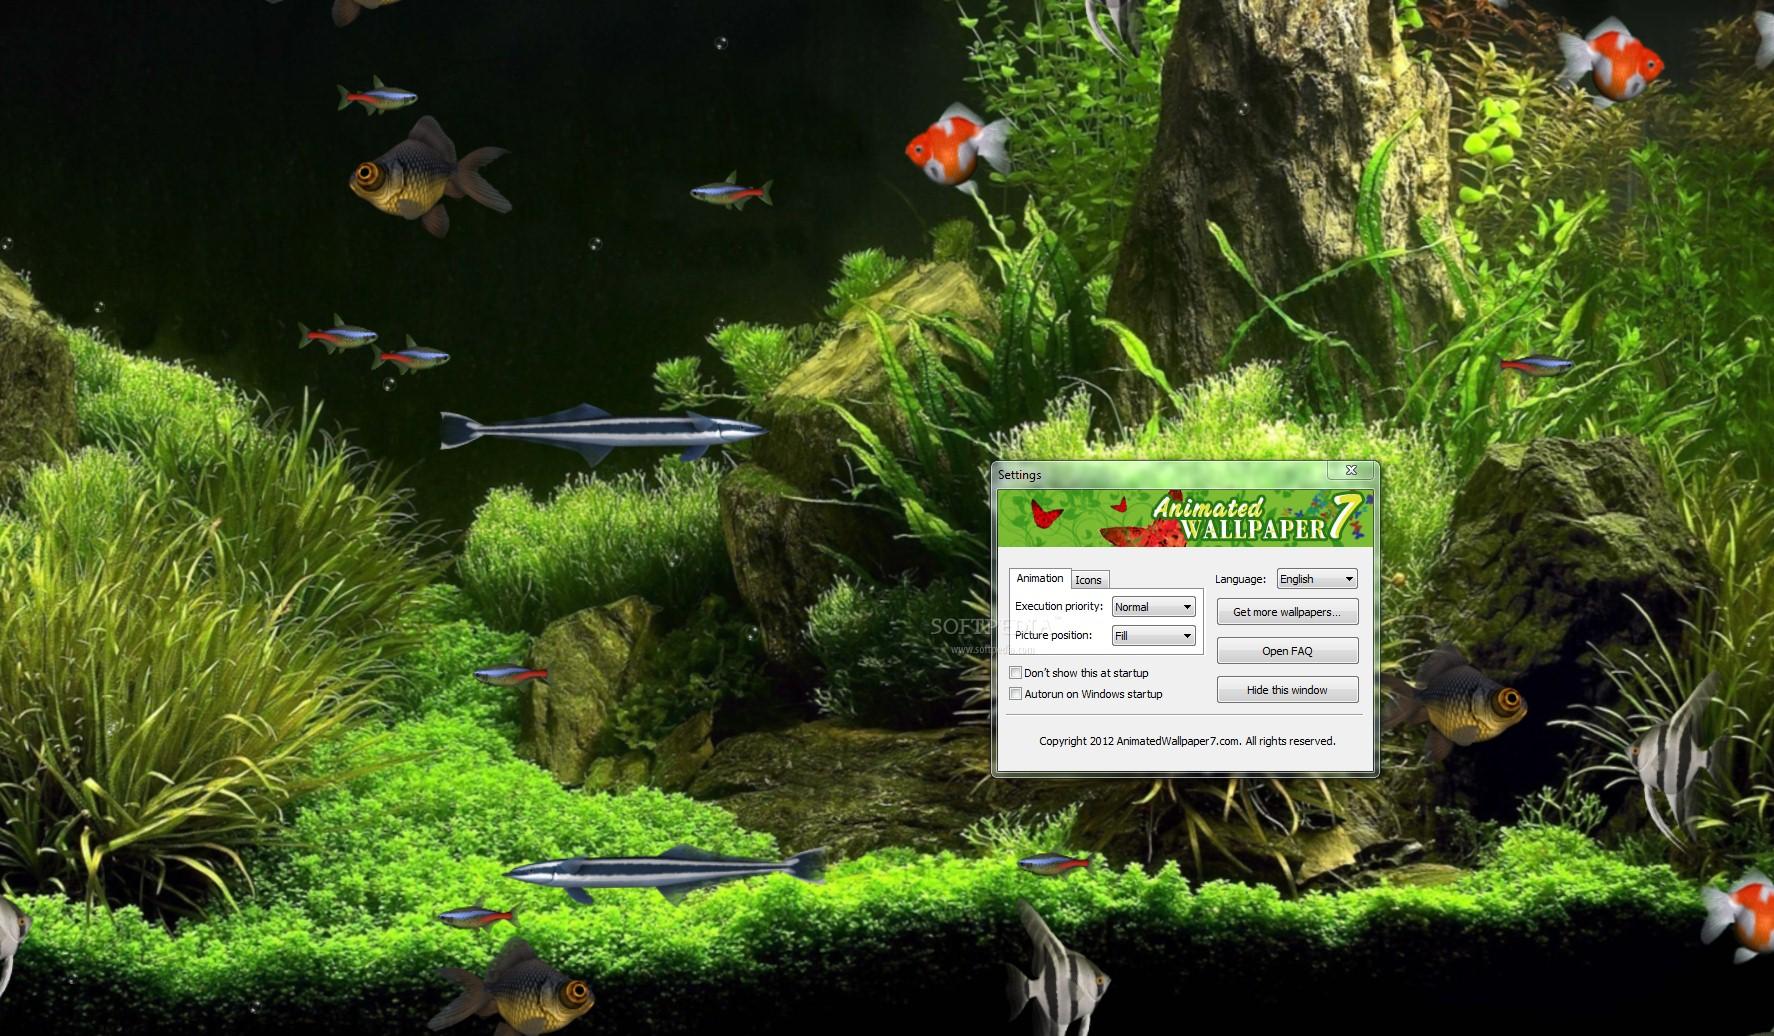 Download virtual aquarium animated wallpaper 1 0 0 - Anime moving wallpaper for pc ...